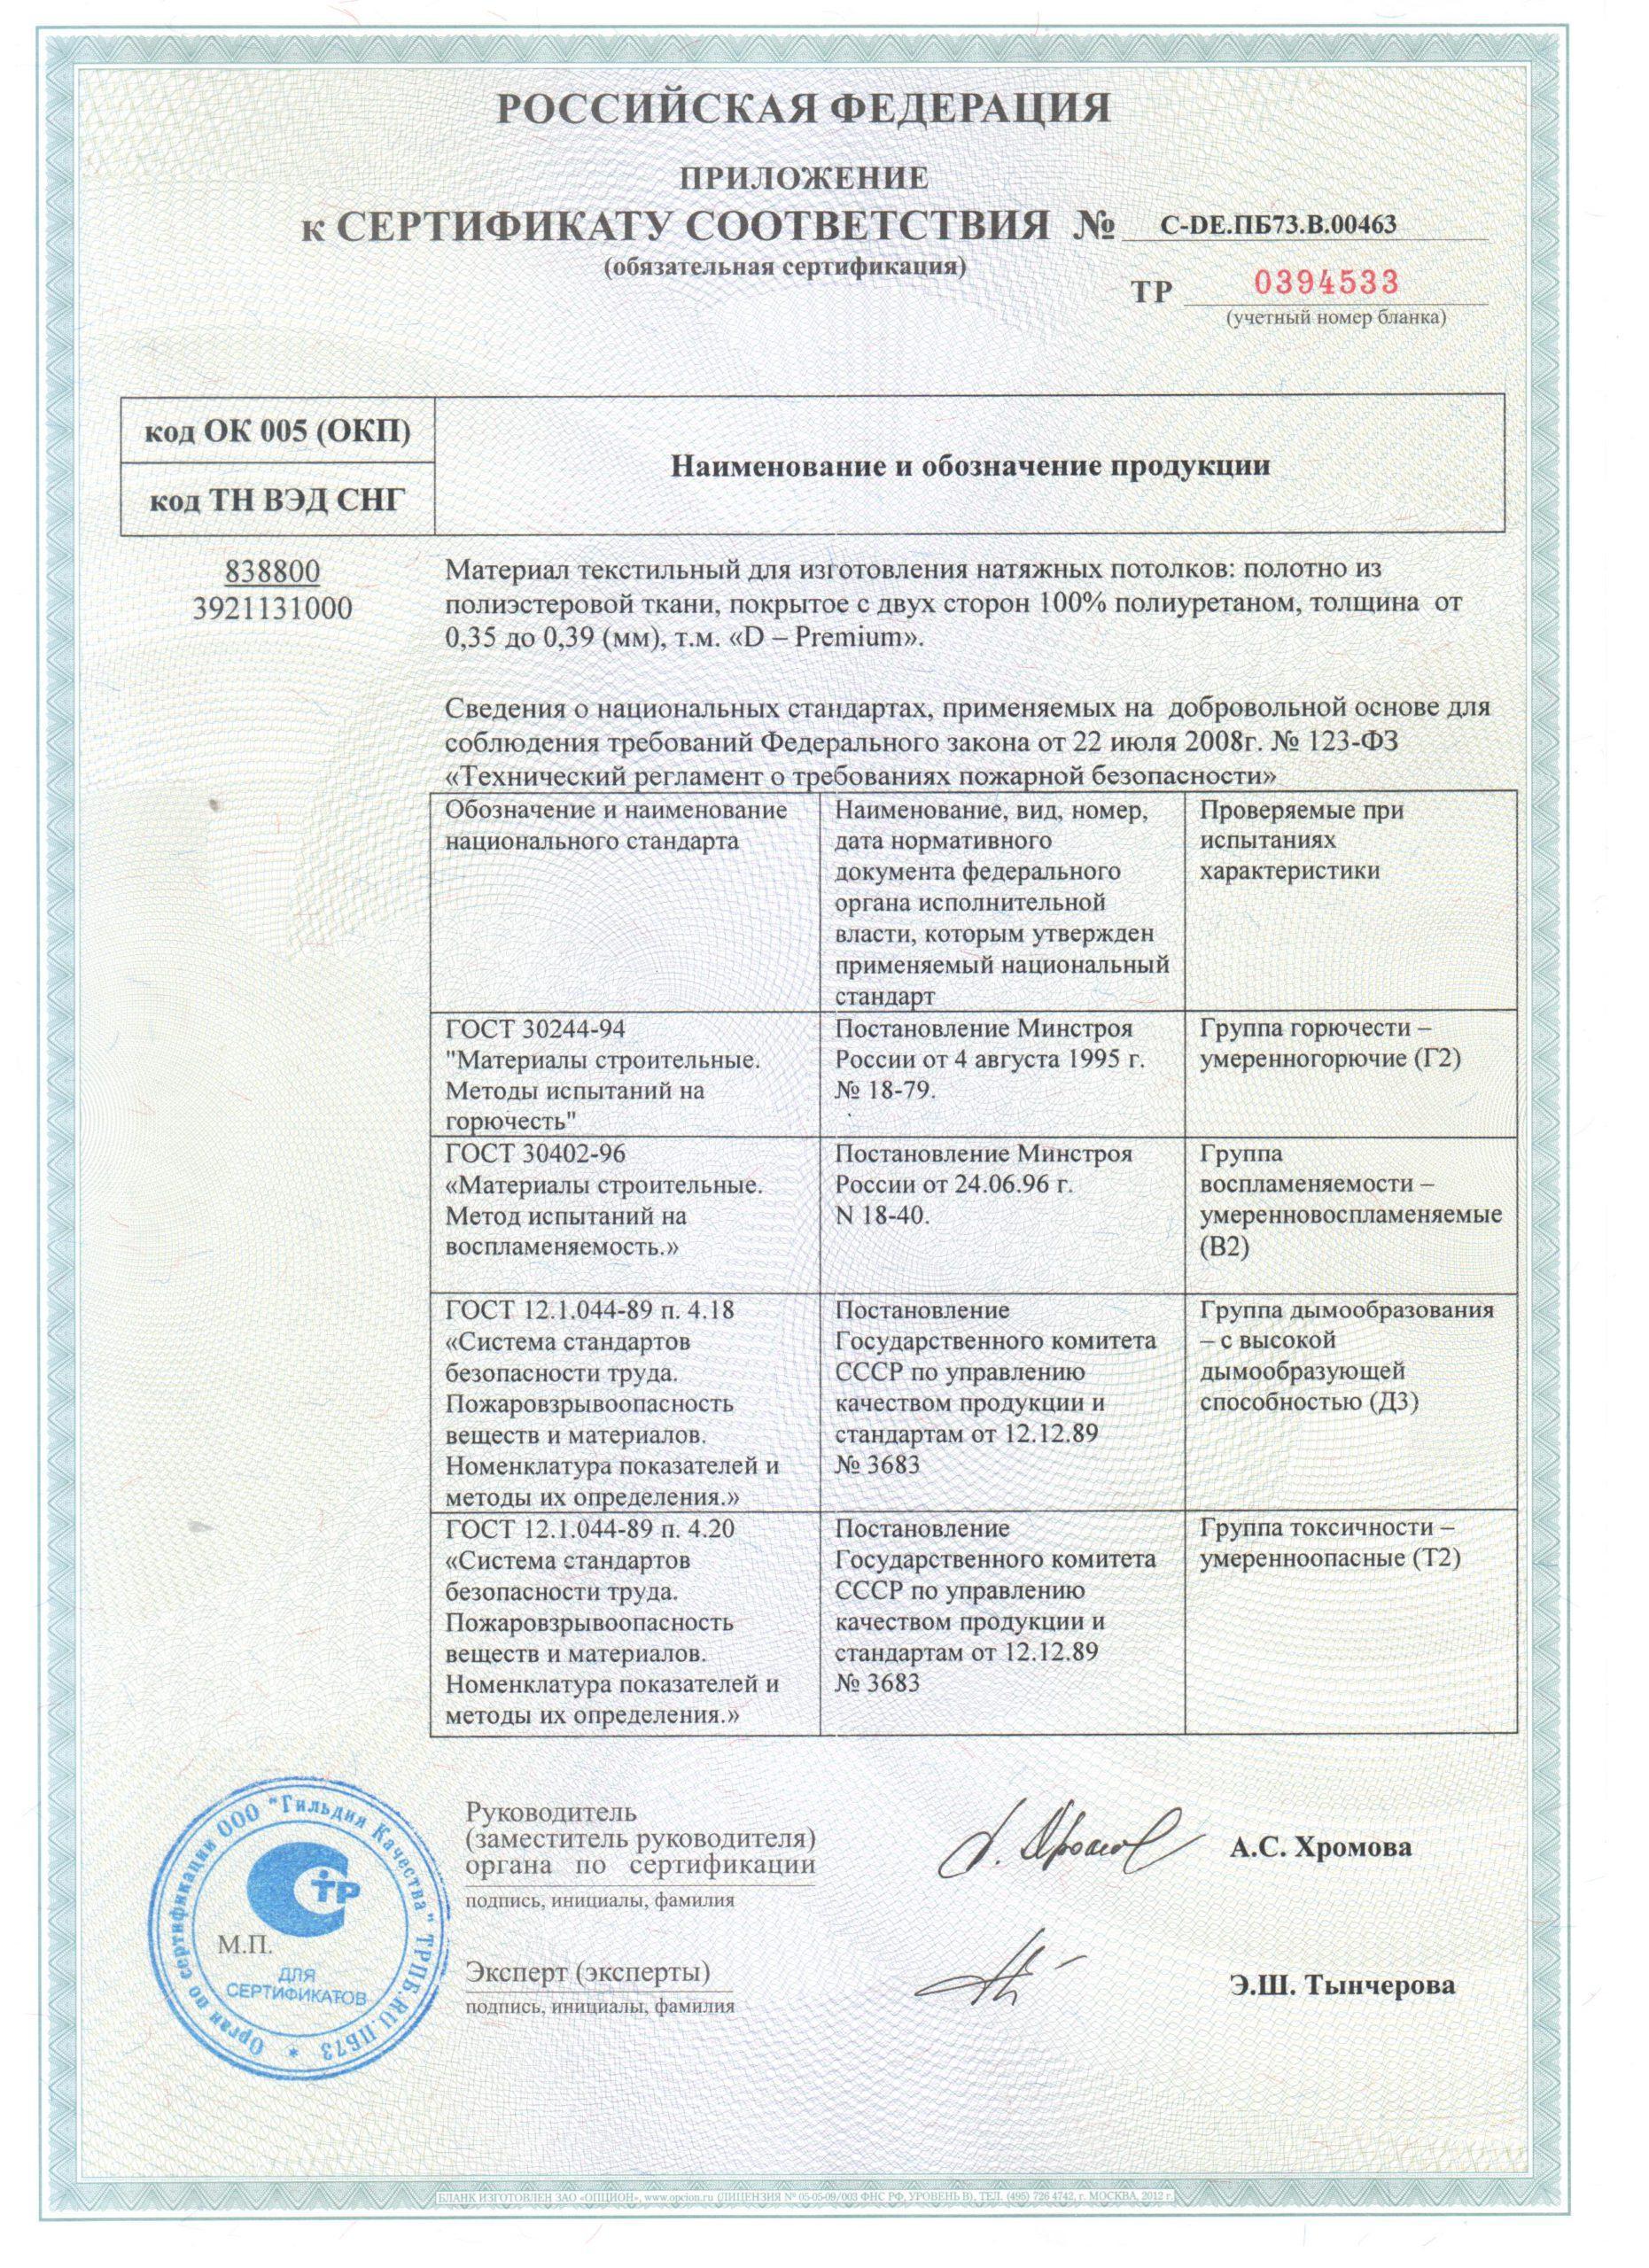 PONGS Дескор сертификат